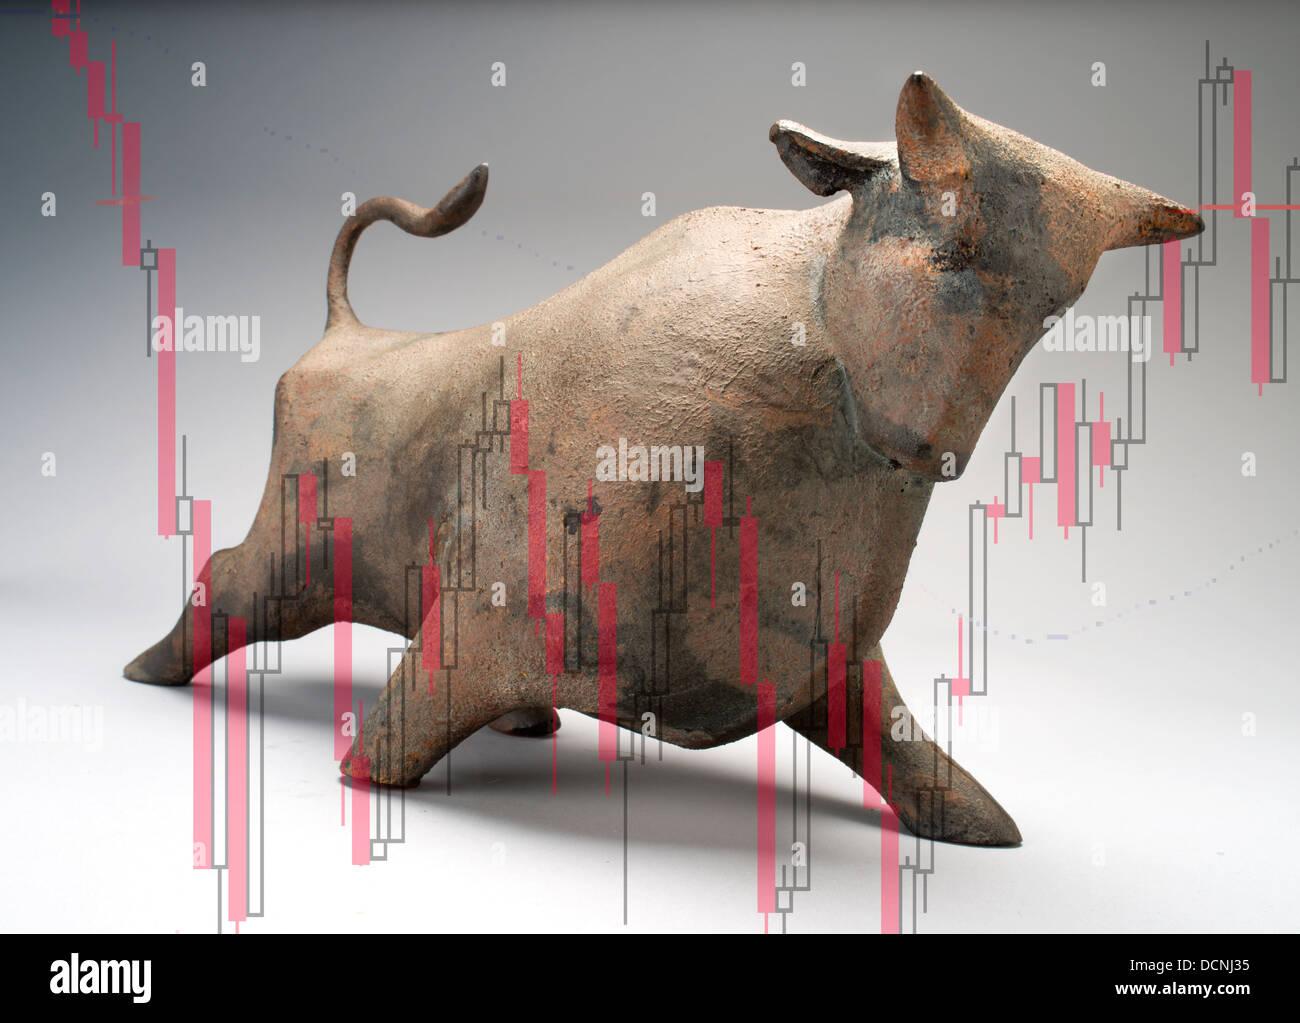 wall street bull - Stock Image